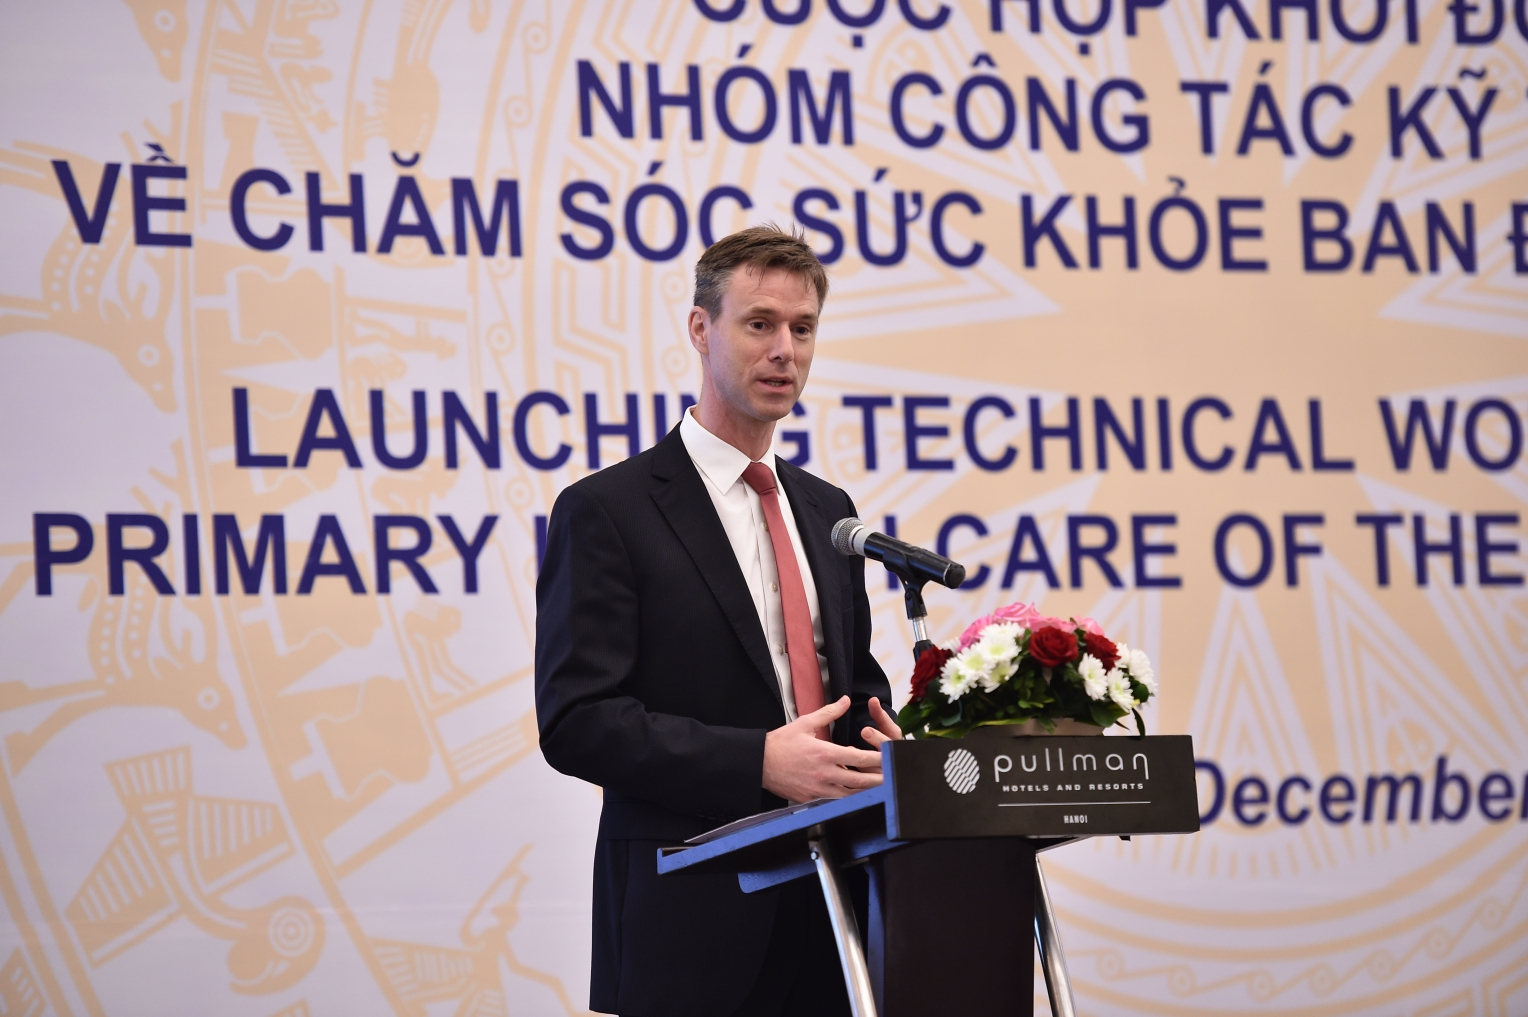 Mr. Roeland Roelofs, Country President at Novartis Viet Nam